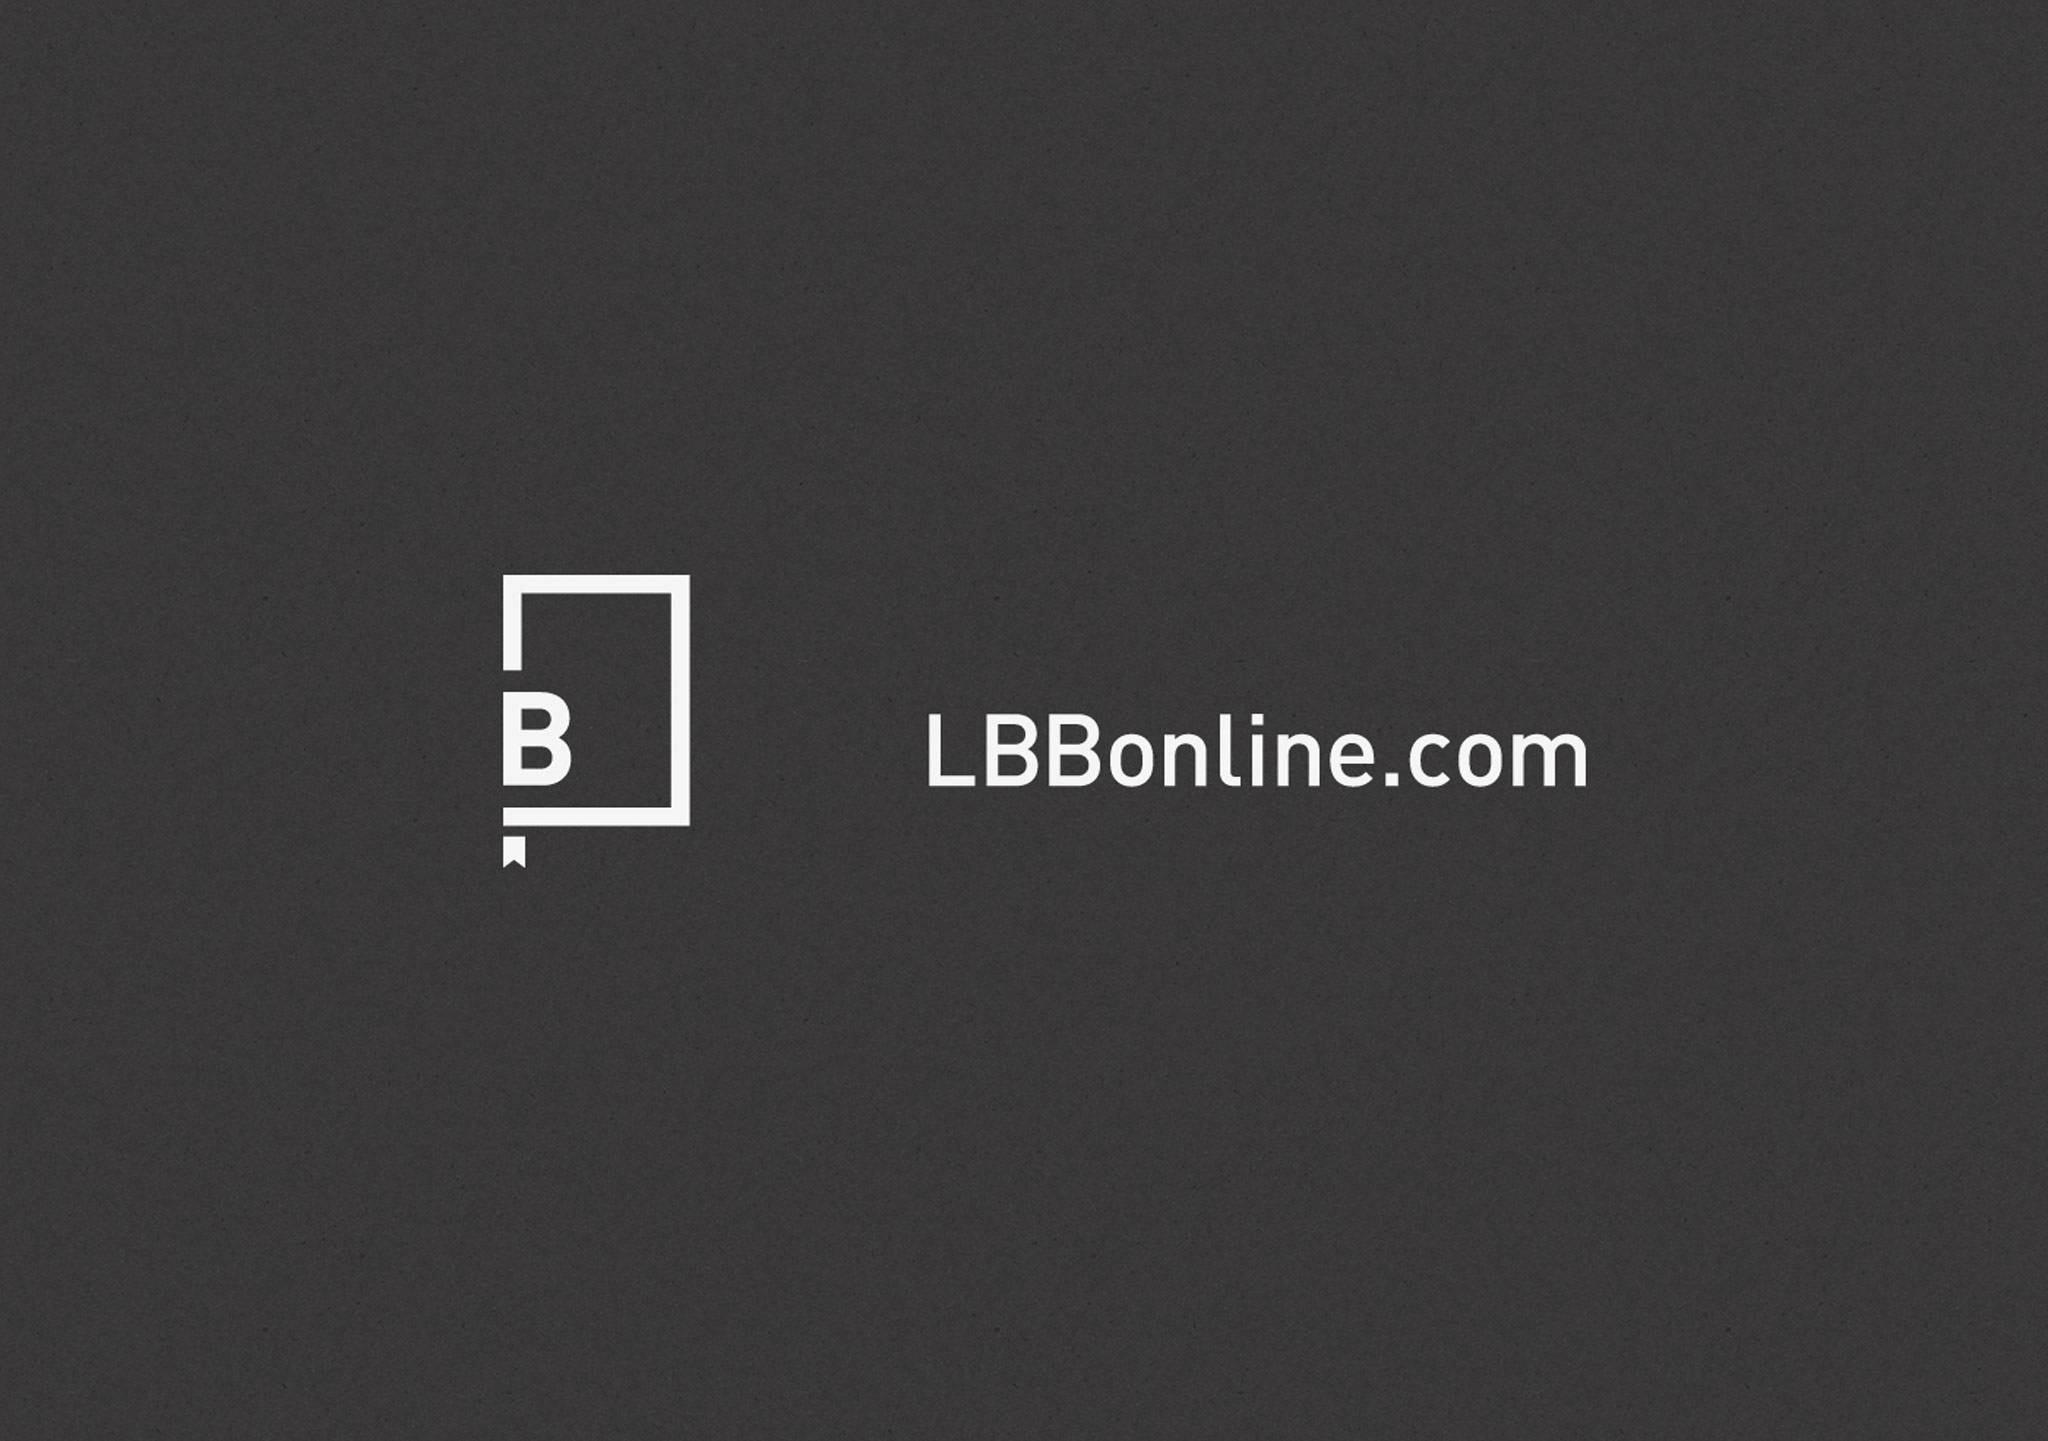 Little Black Book Online - July, 2017